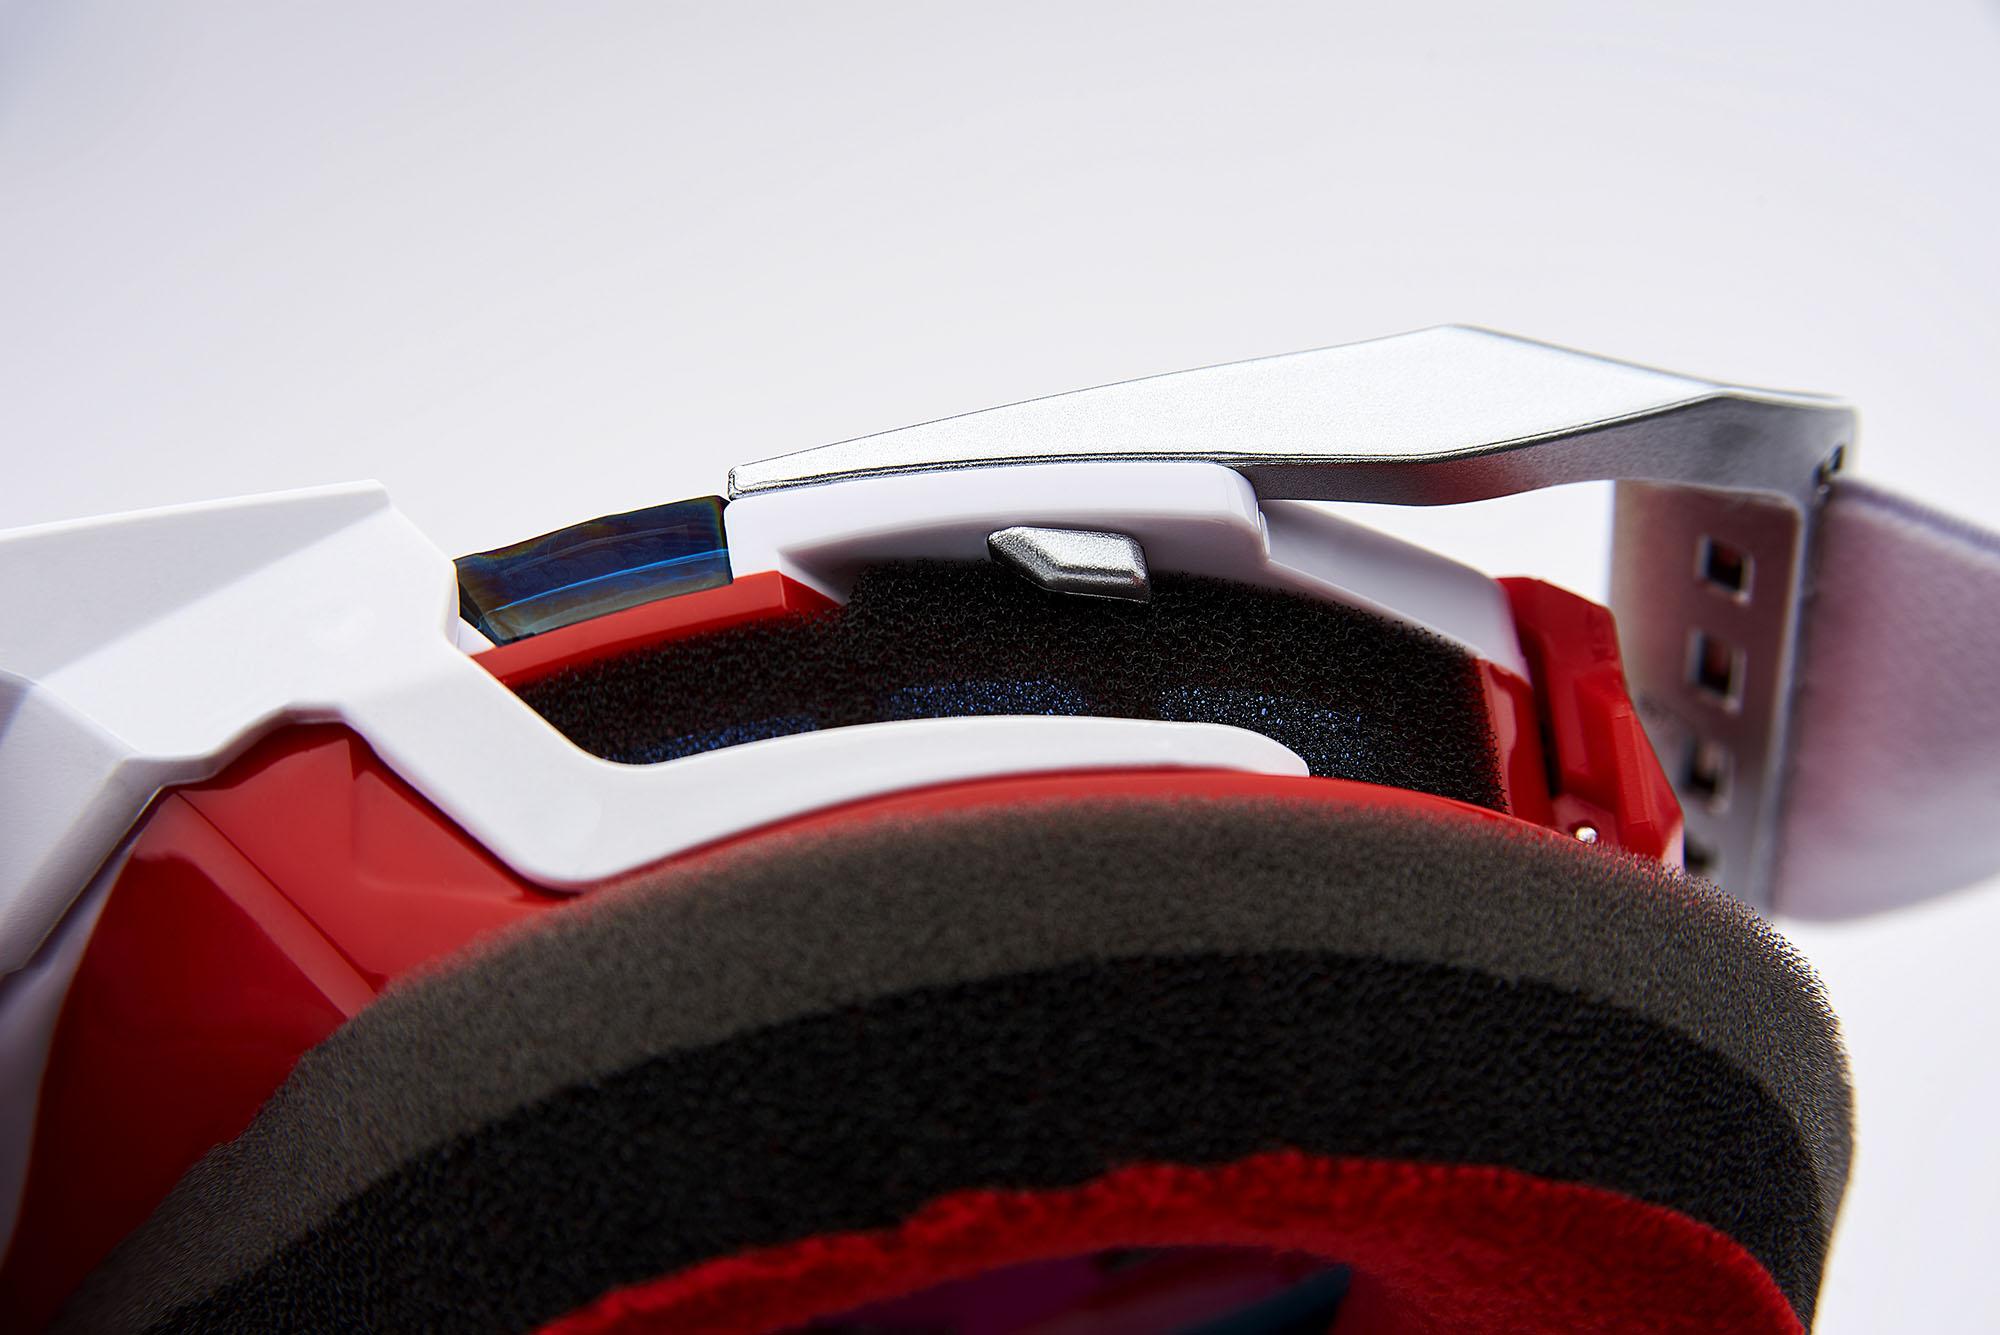 50710-355-02-Detail-104.jpg